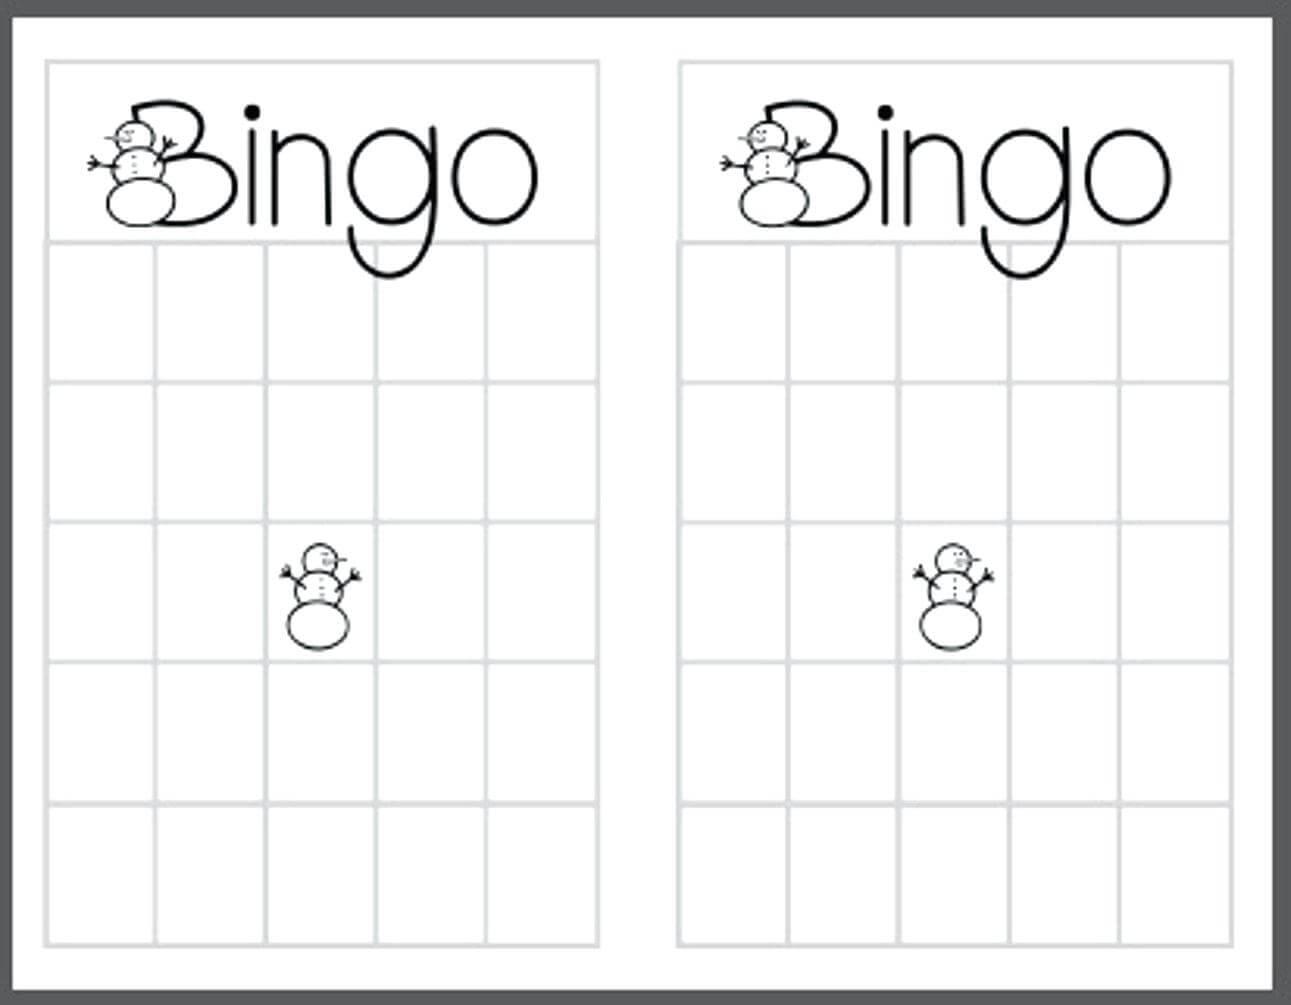 023 Template Ideas Blank Bingo Stirring Card For Baby Shower With Regard To Blank Bingo Card Template Microsoft Word